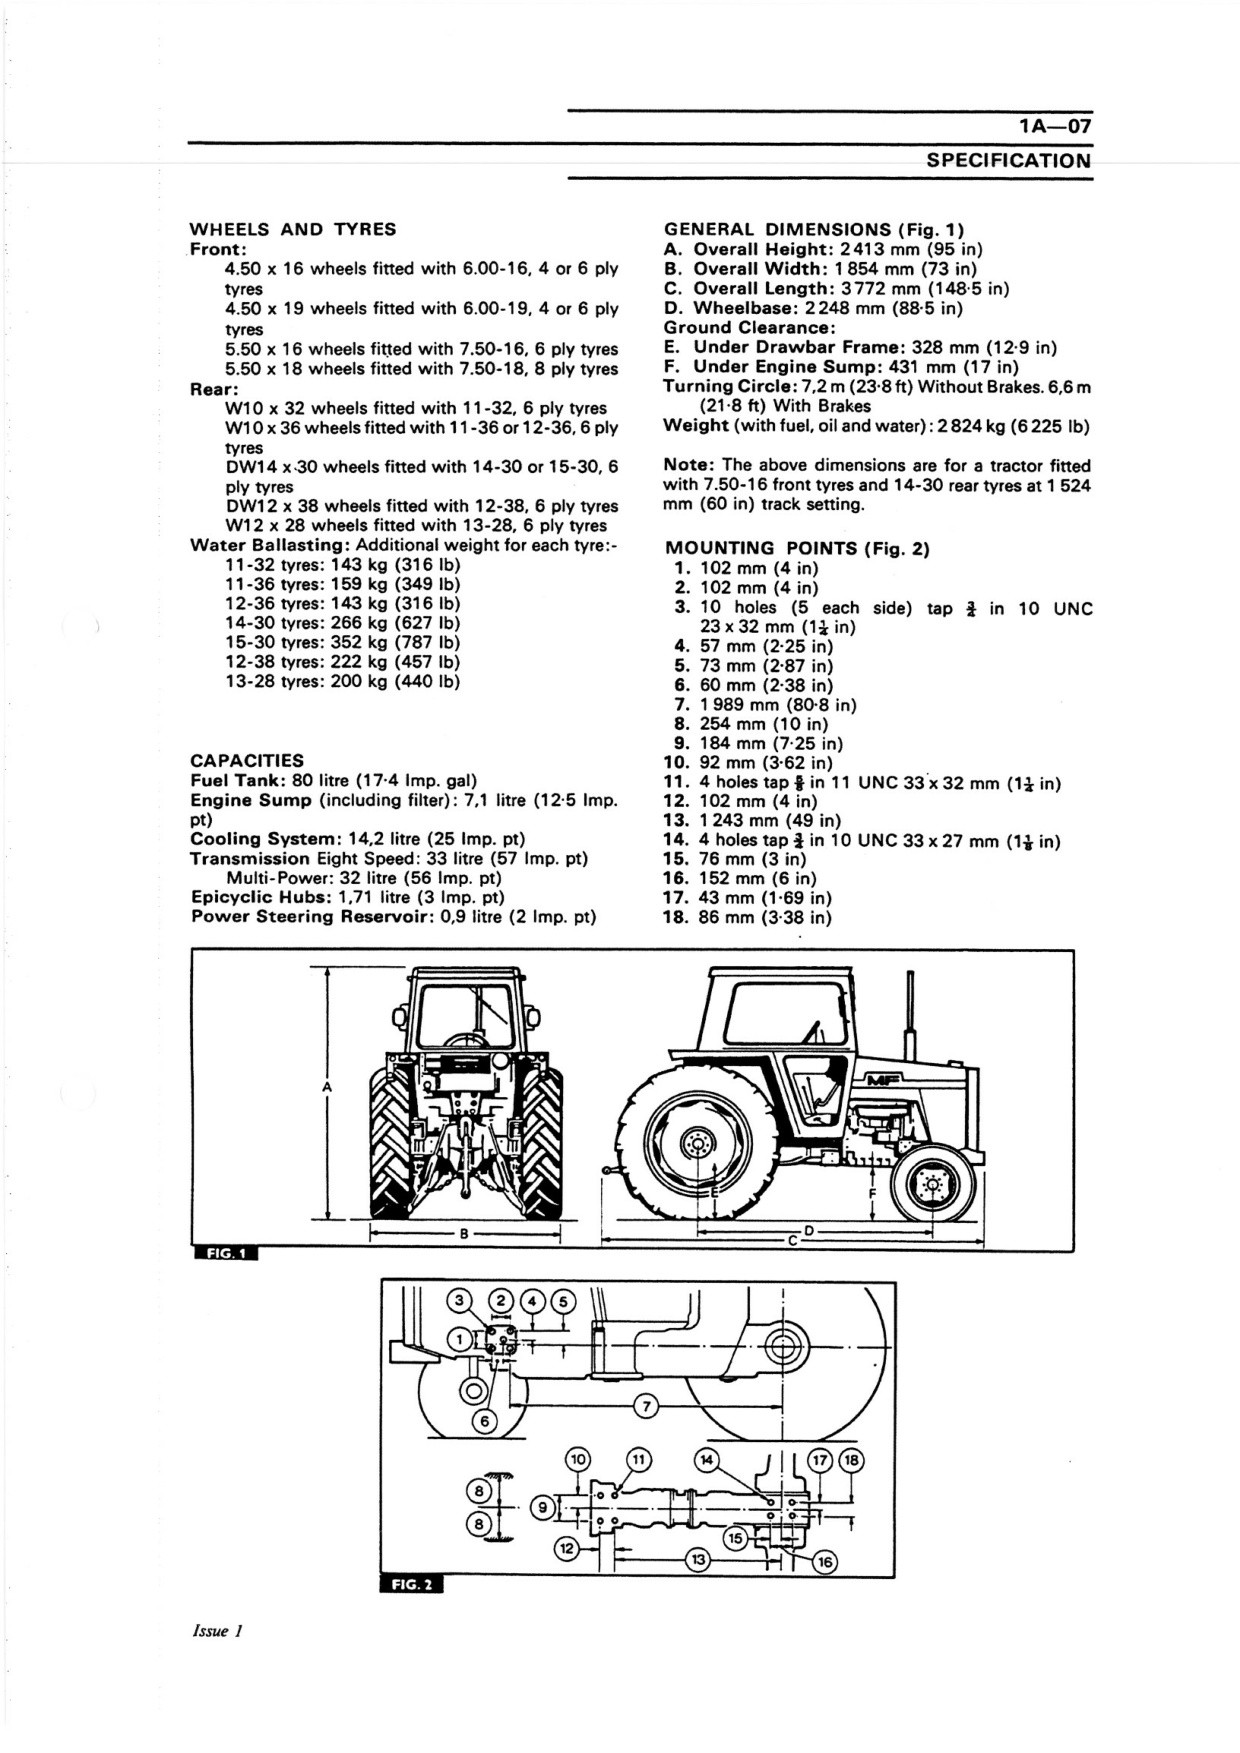 ... factory service and repair manual Array - manual 153210g2 rh manual  153210g2 vwhost org